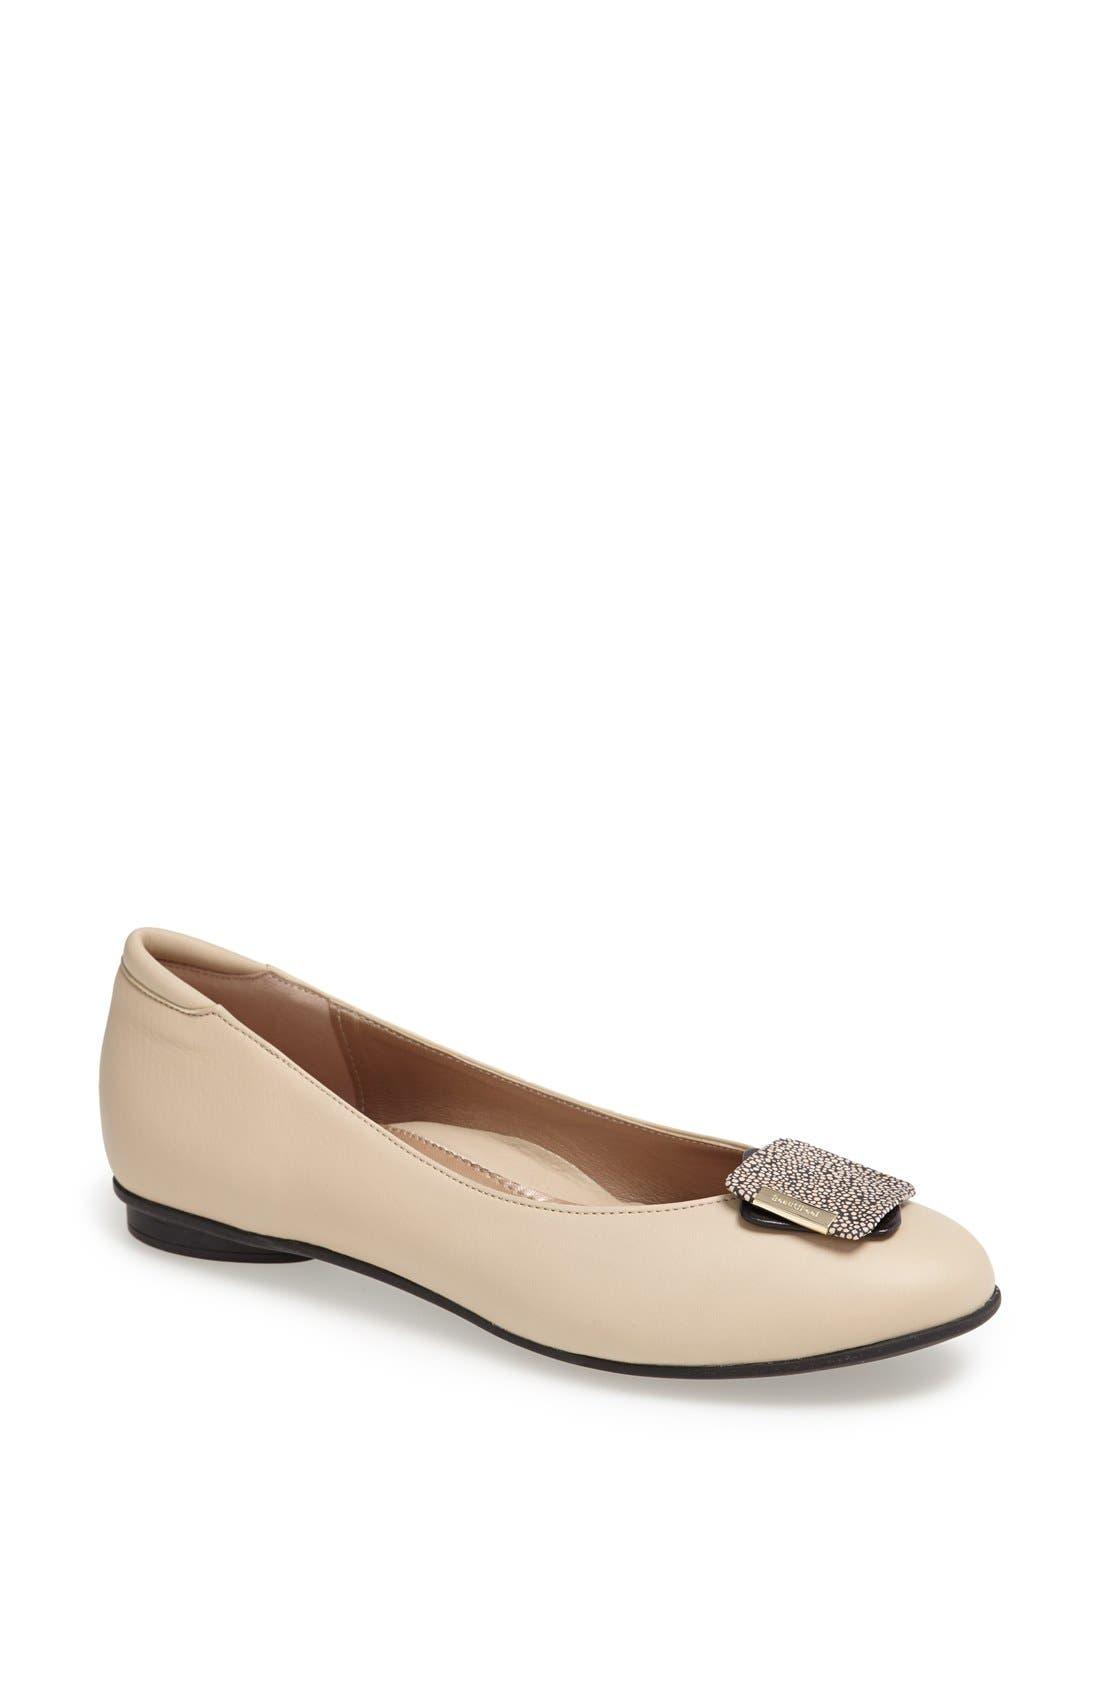 Main Image - BeautiFeel 'Shelly' Leather Flat